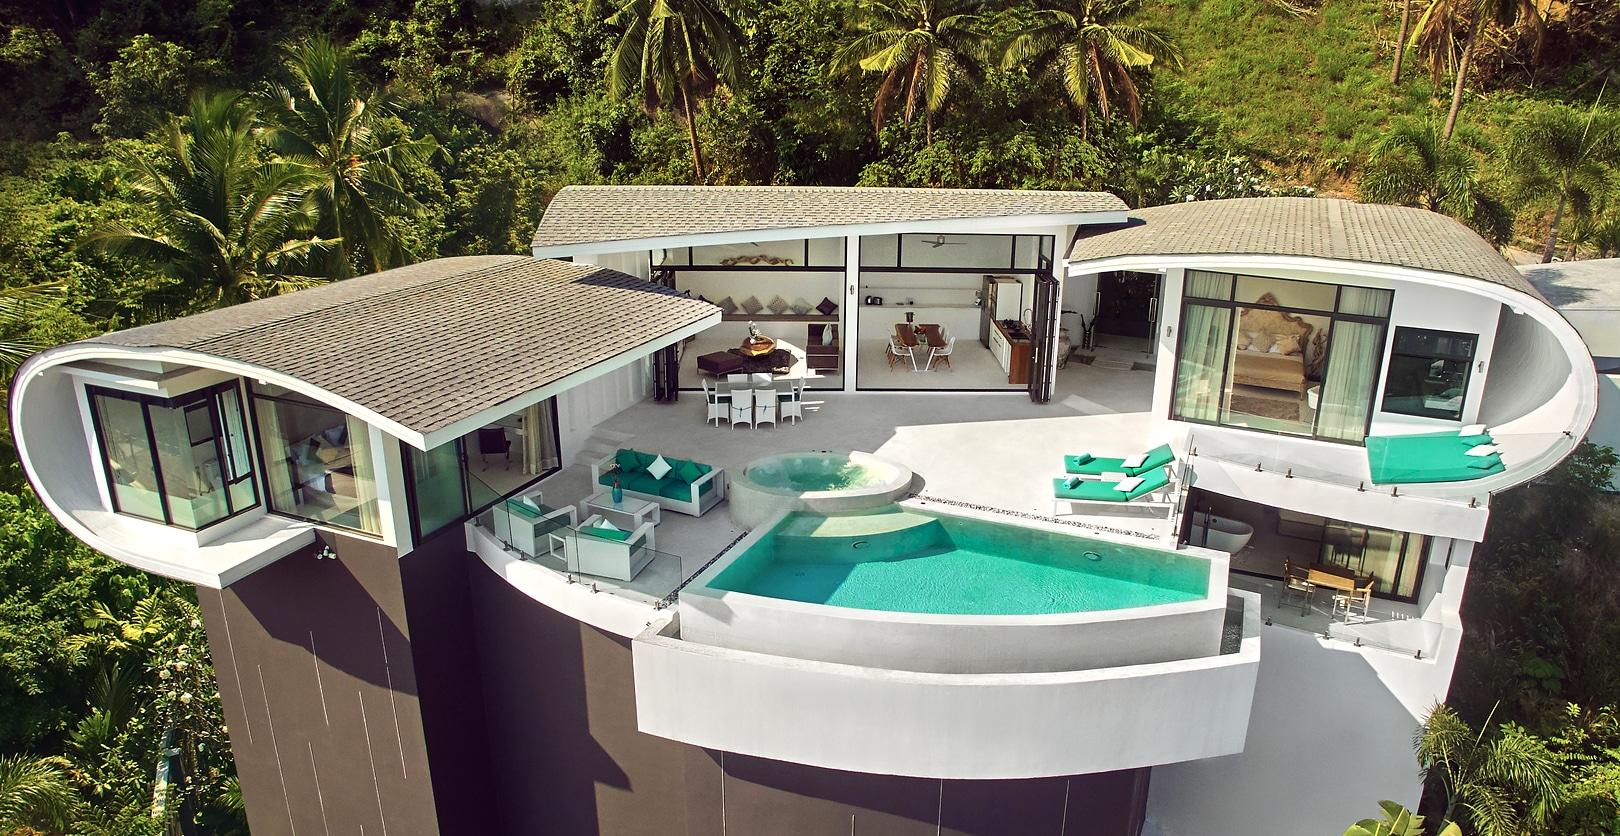 Chaweng Noi Luxury Dream Villa Koh Samui